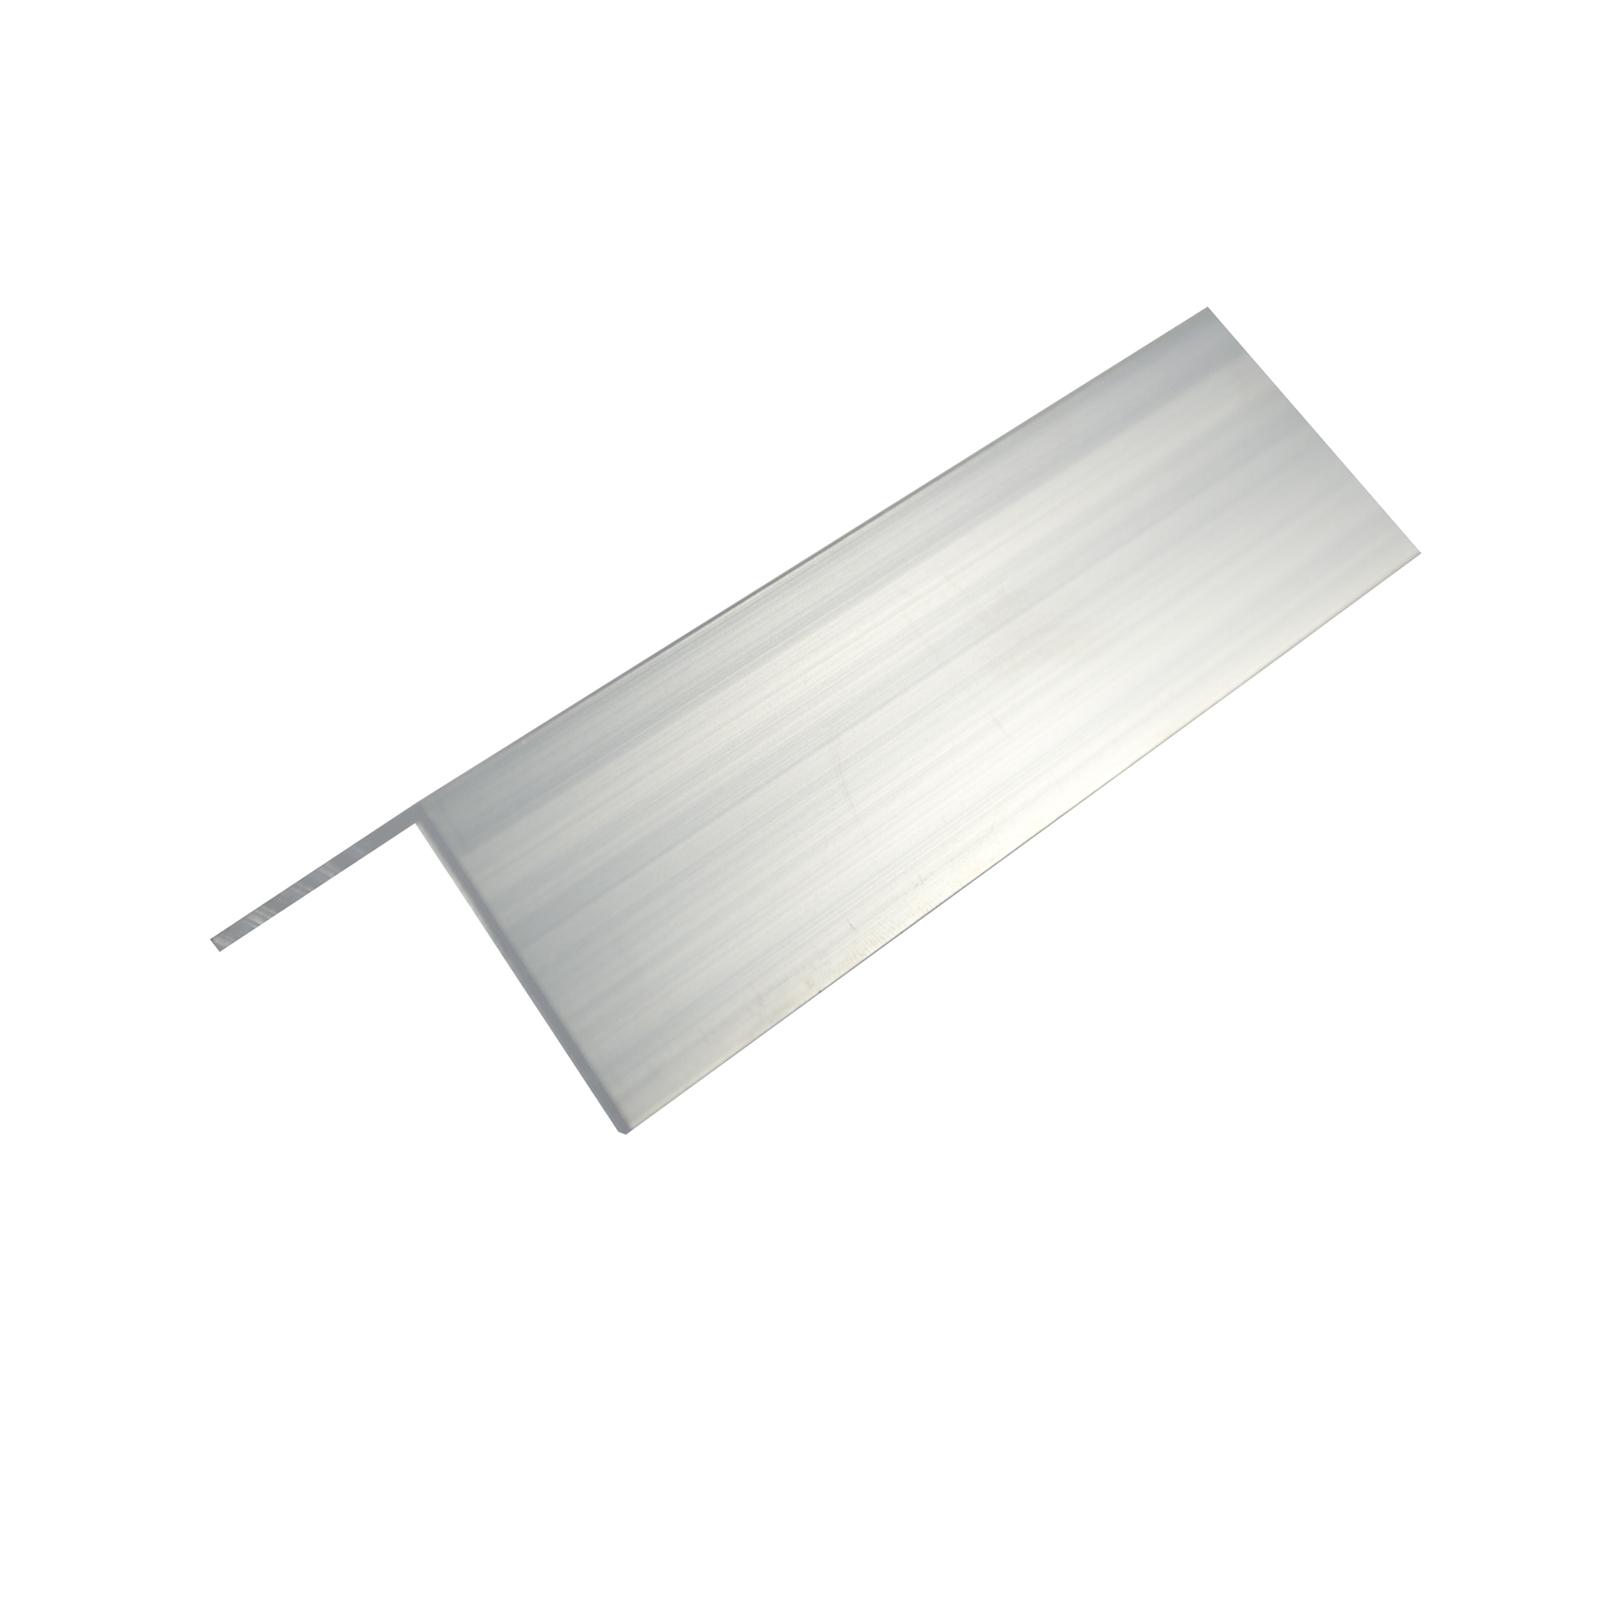 Metal Mate 20 x 20 x 3mm 1m Aluminium Equal Angle